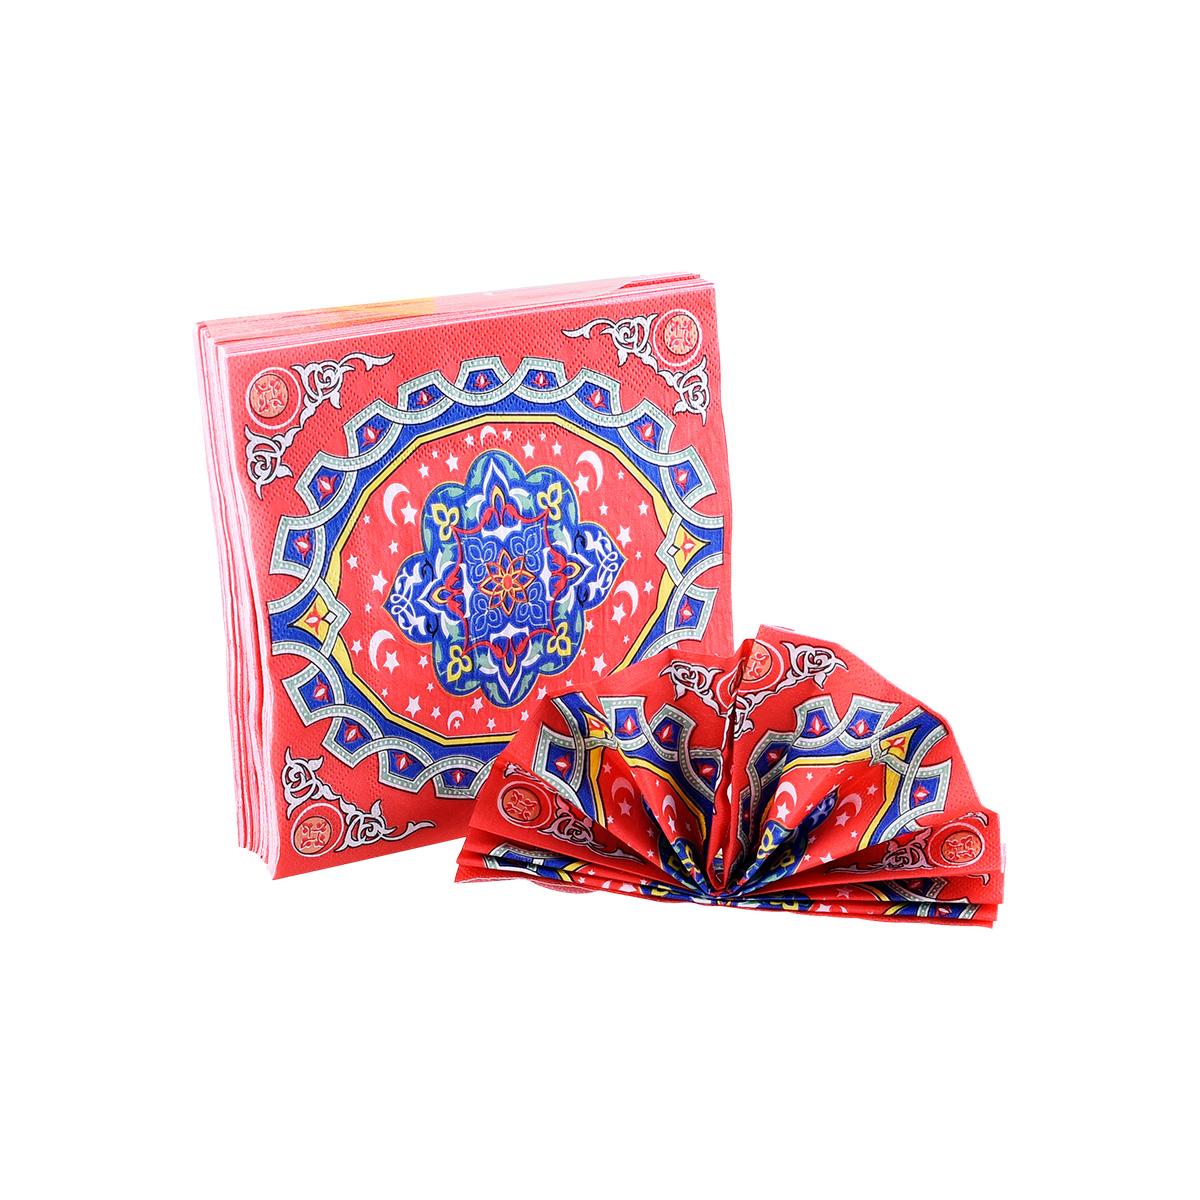 مناديل سفرة رمضان ملون رقم 1-40000